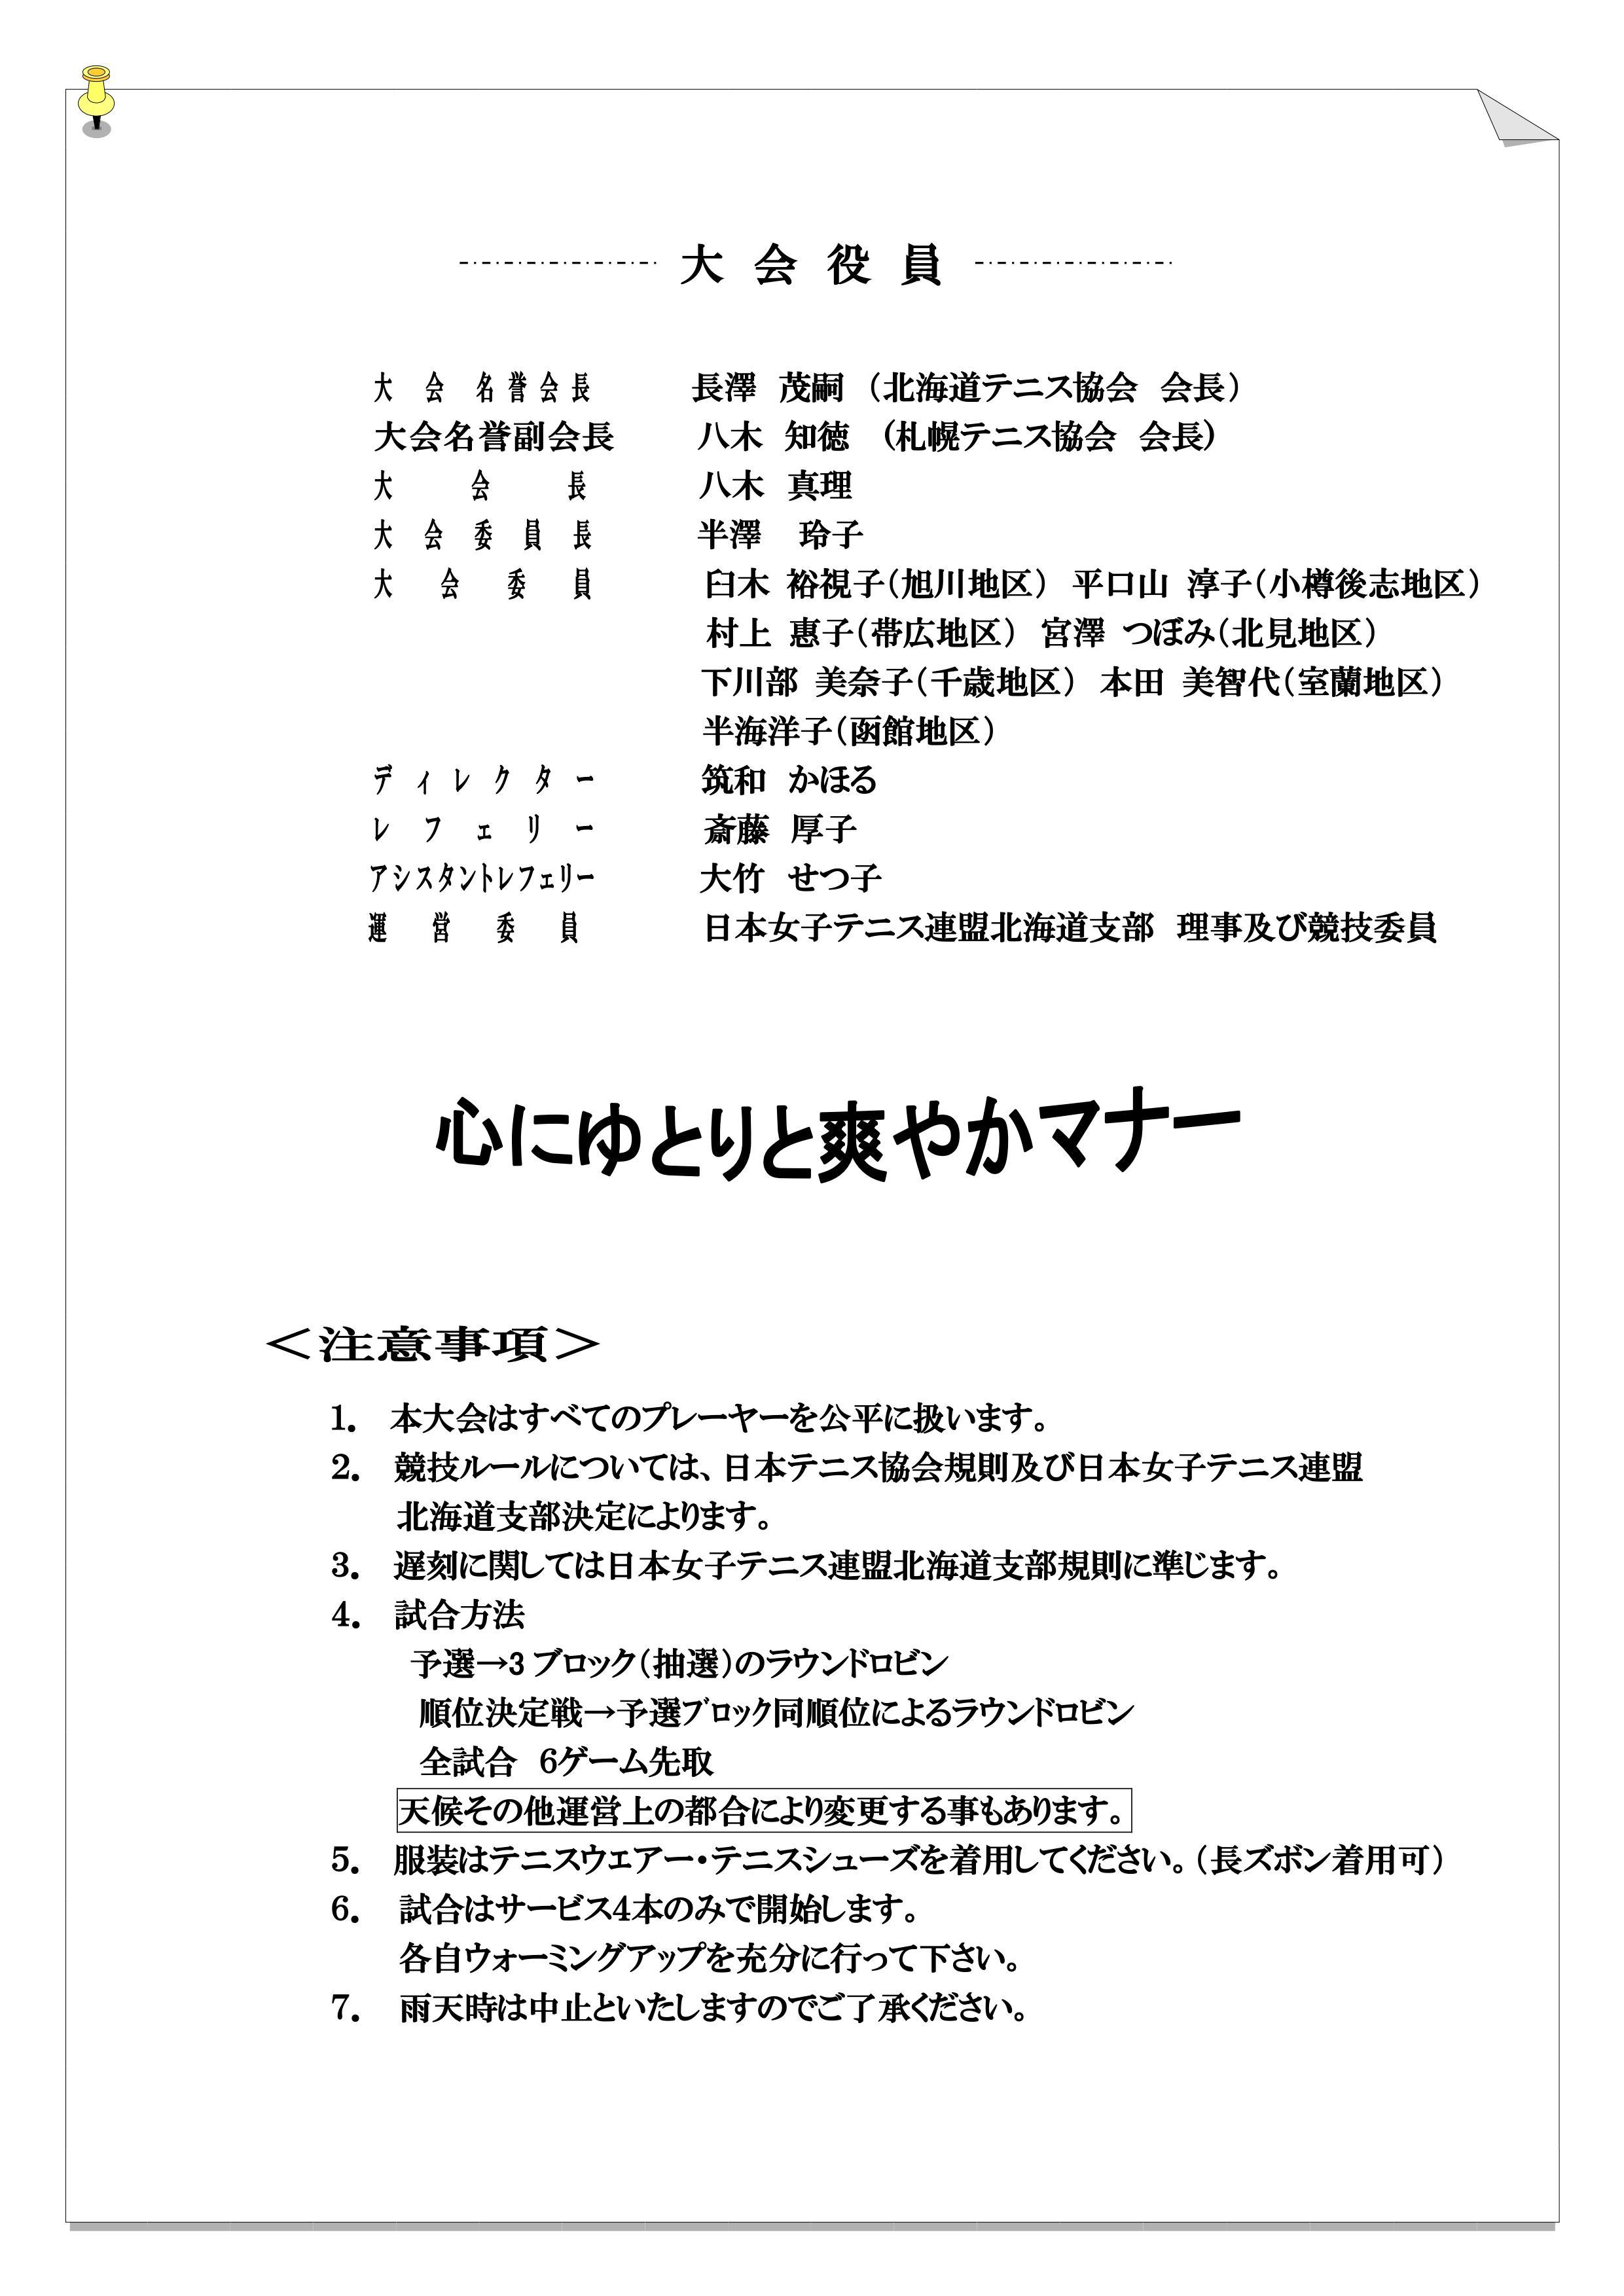 8district_program2